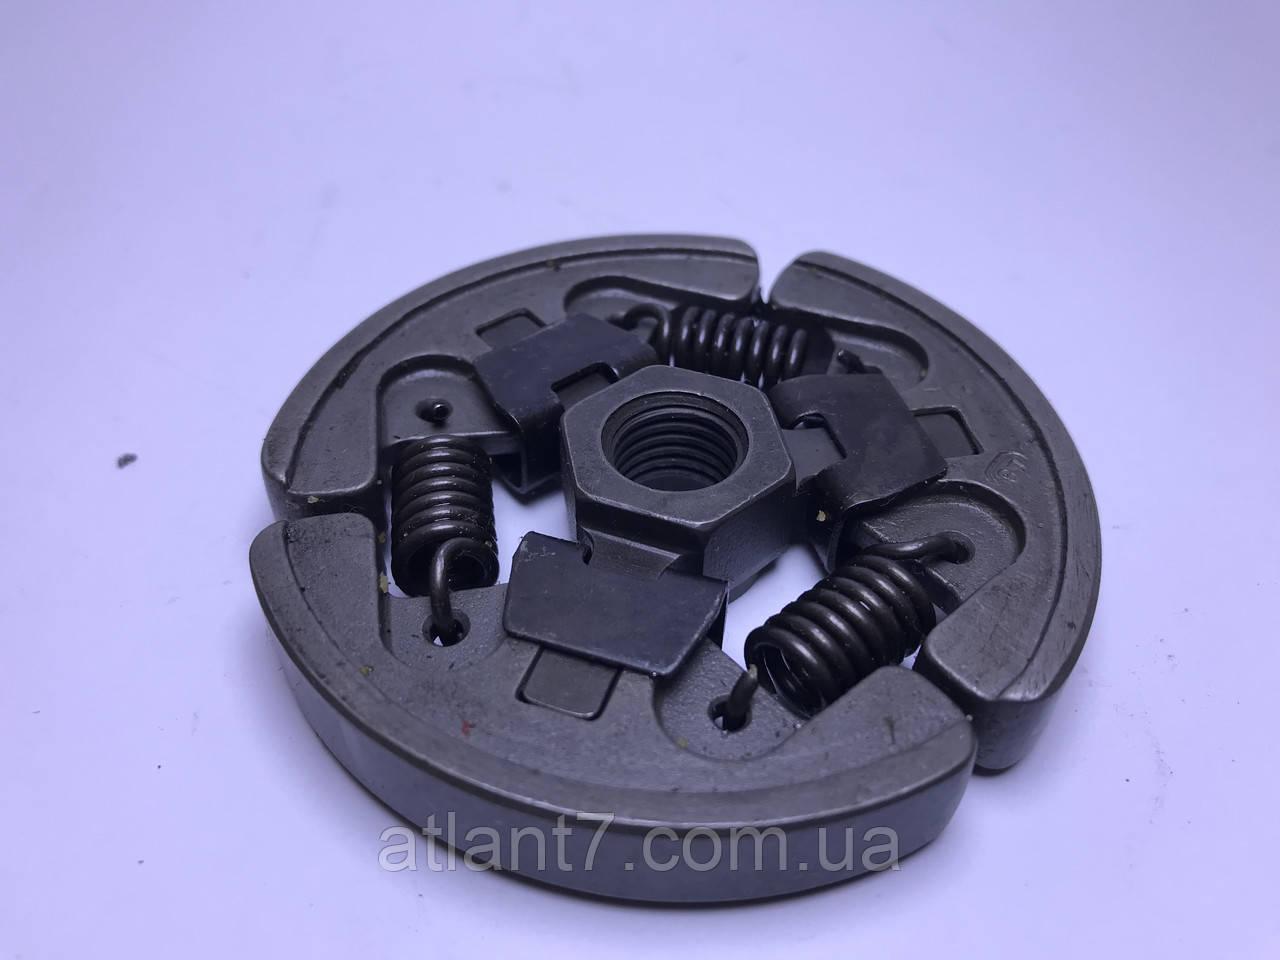 Мотор Сич сцепление